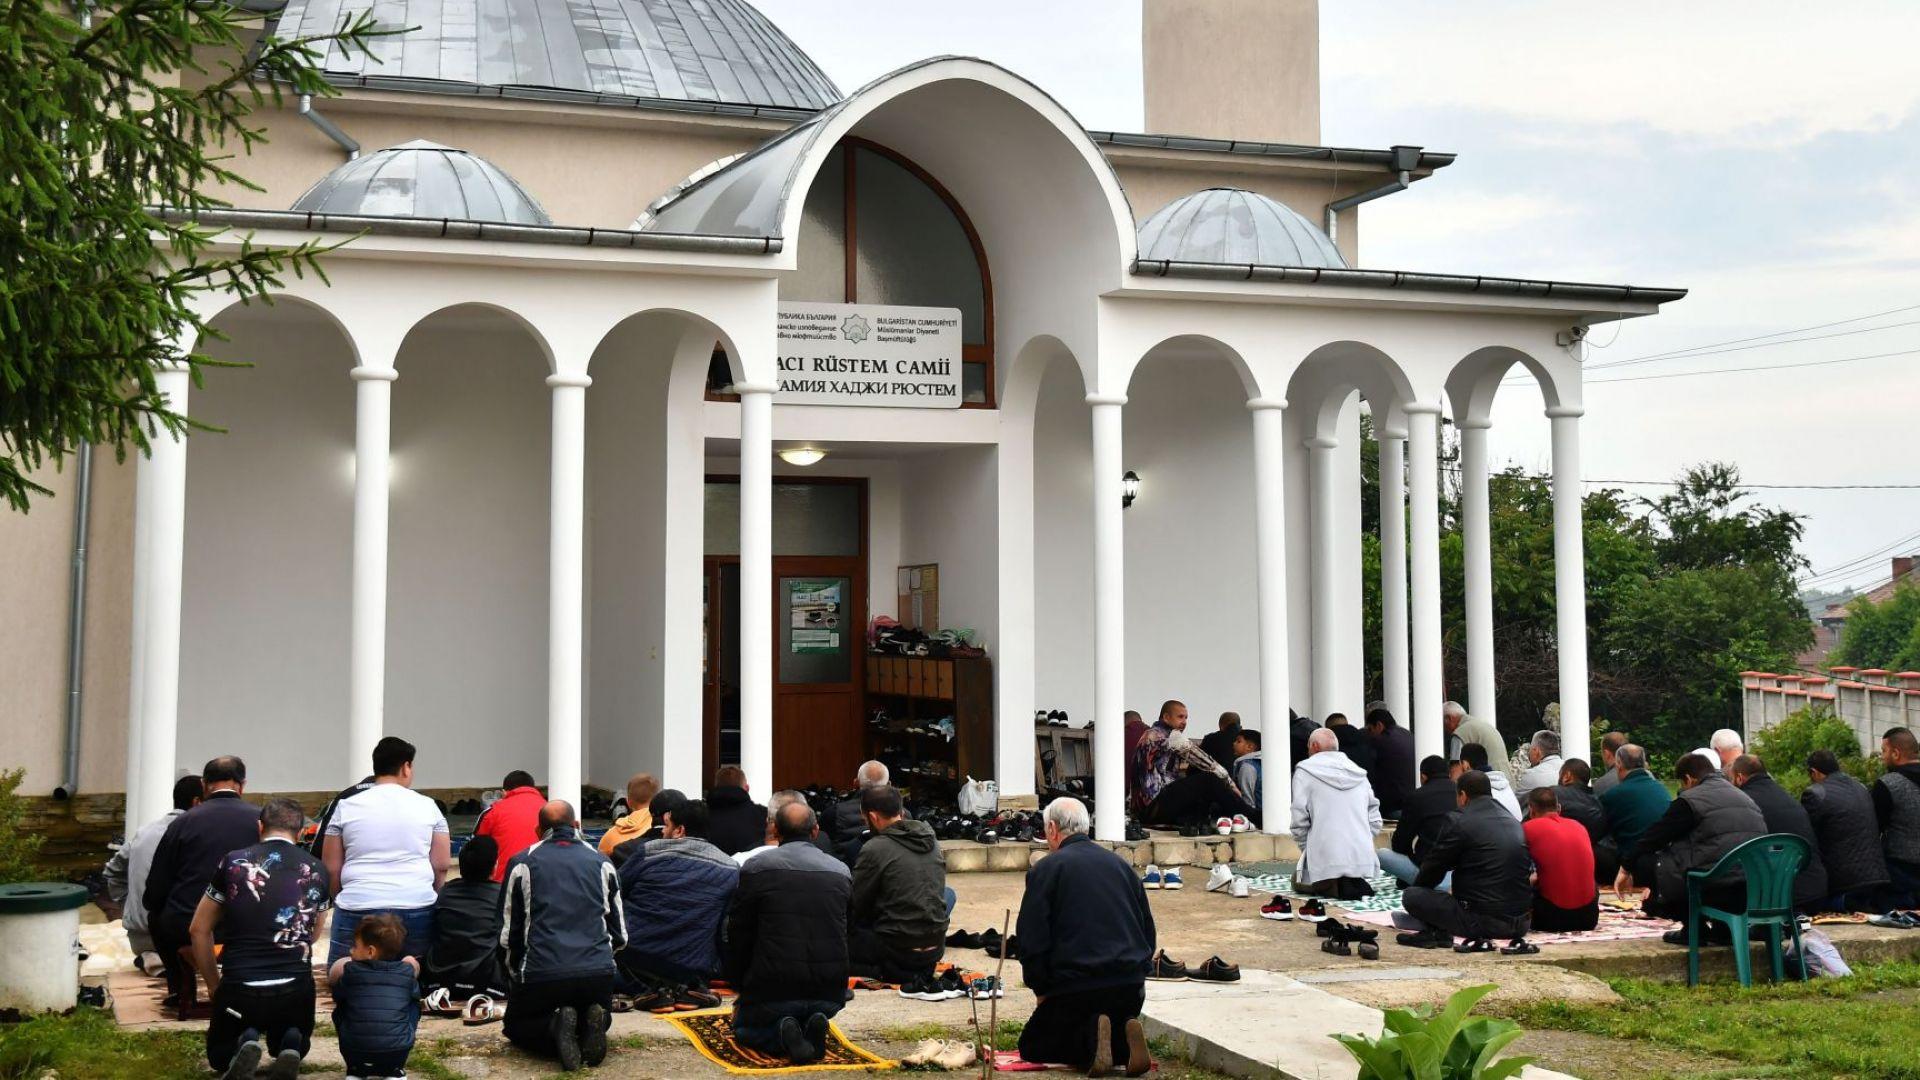 Борисов и Радев поздравиха мюсюлманите за Рамазан Байрам